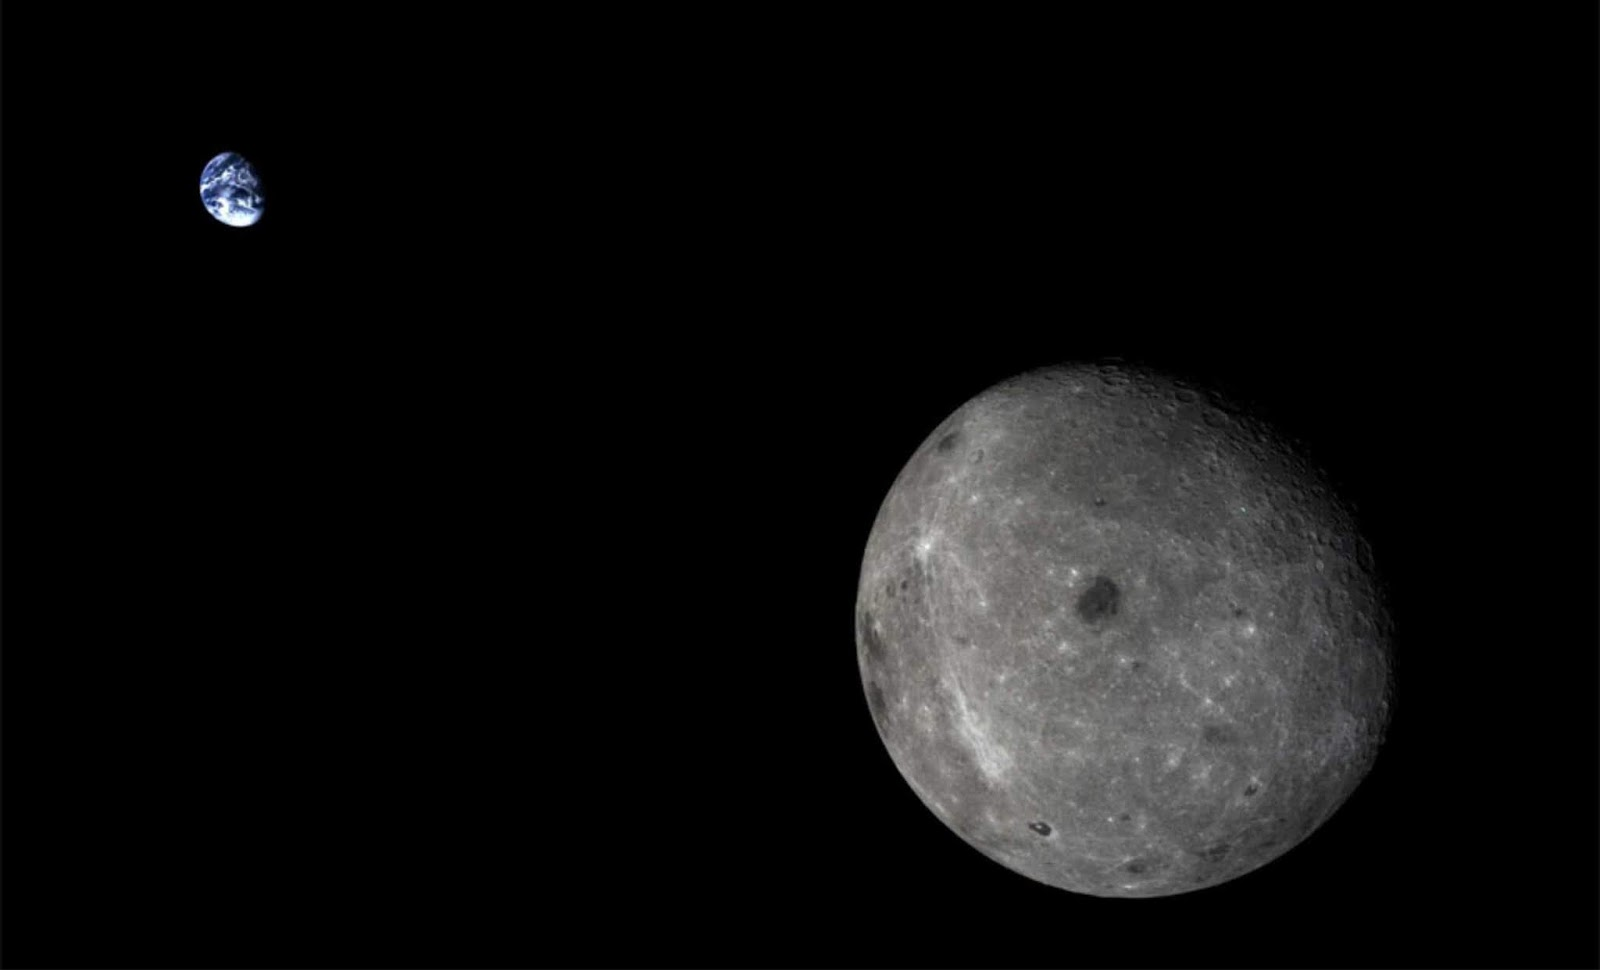 Ilmuwan AS dan Rusia berdiskusi menciptakan sistem navigasi global di sekitar bulan